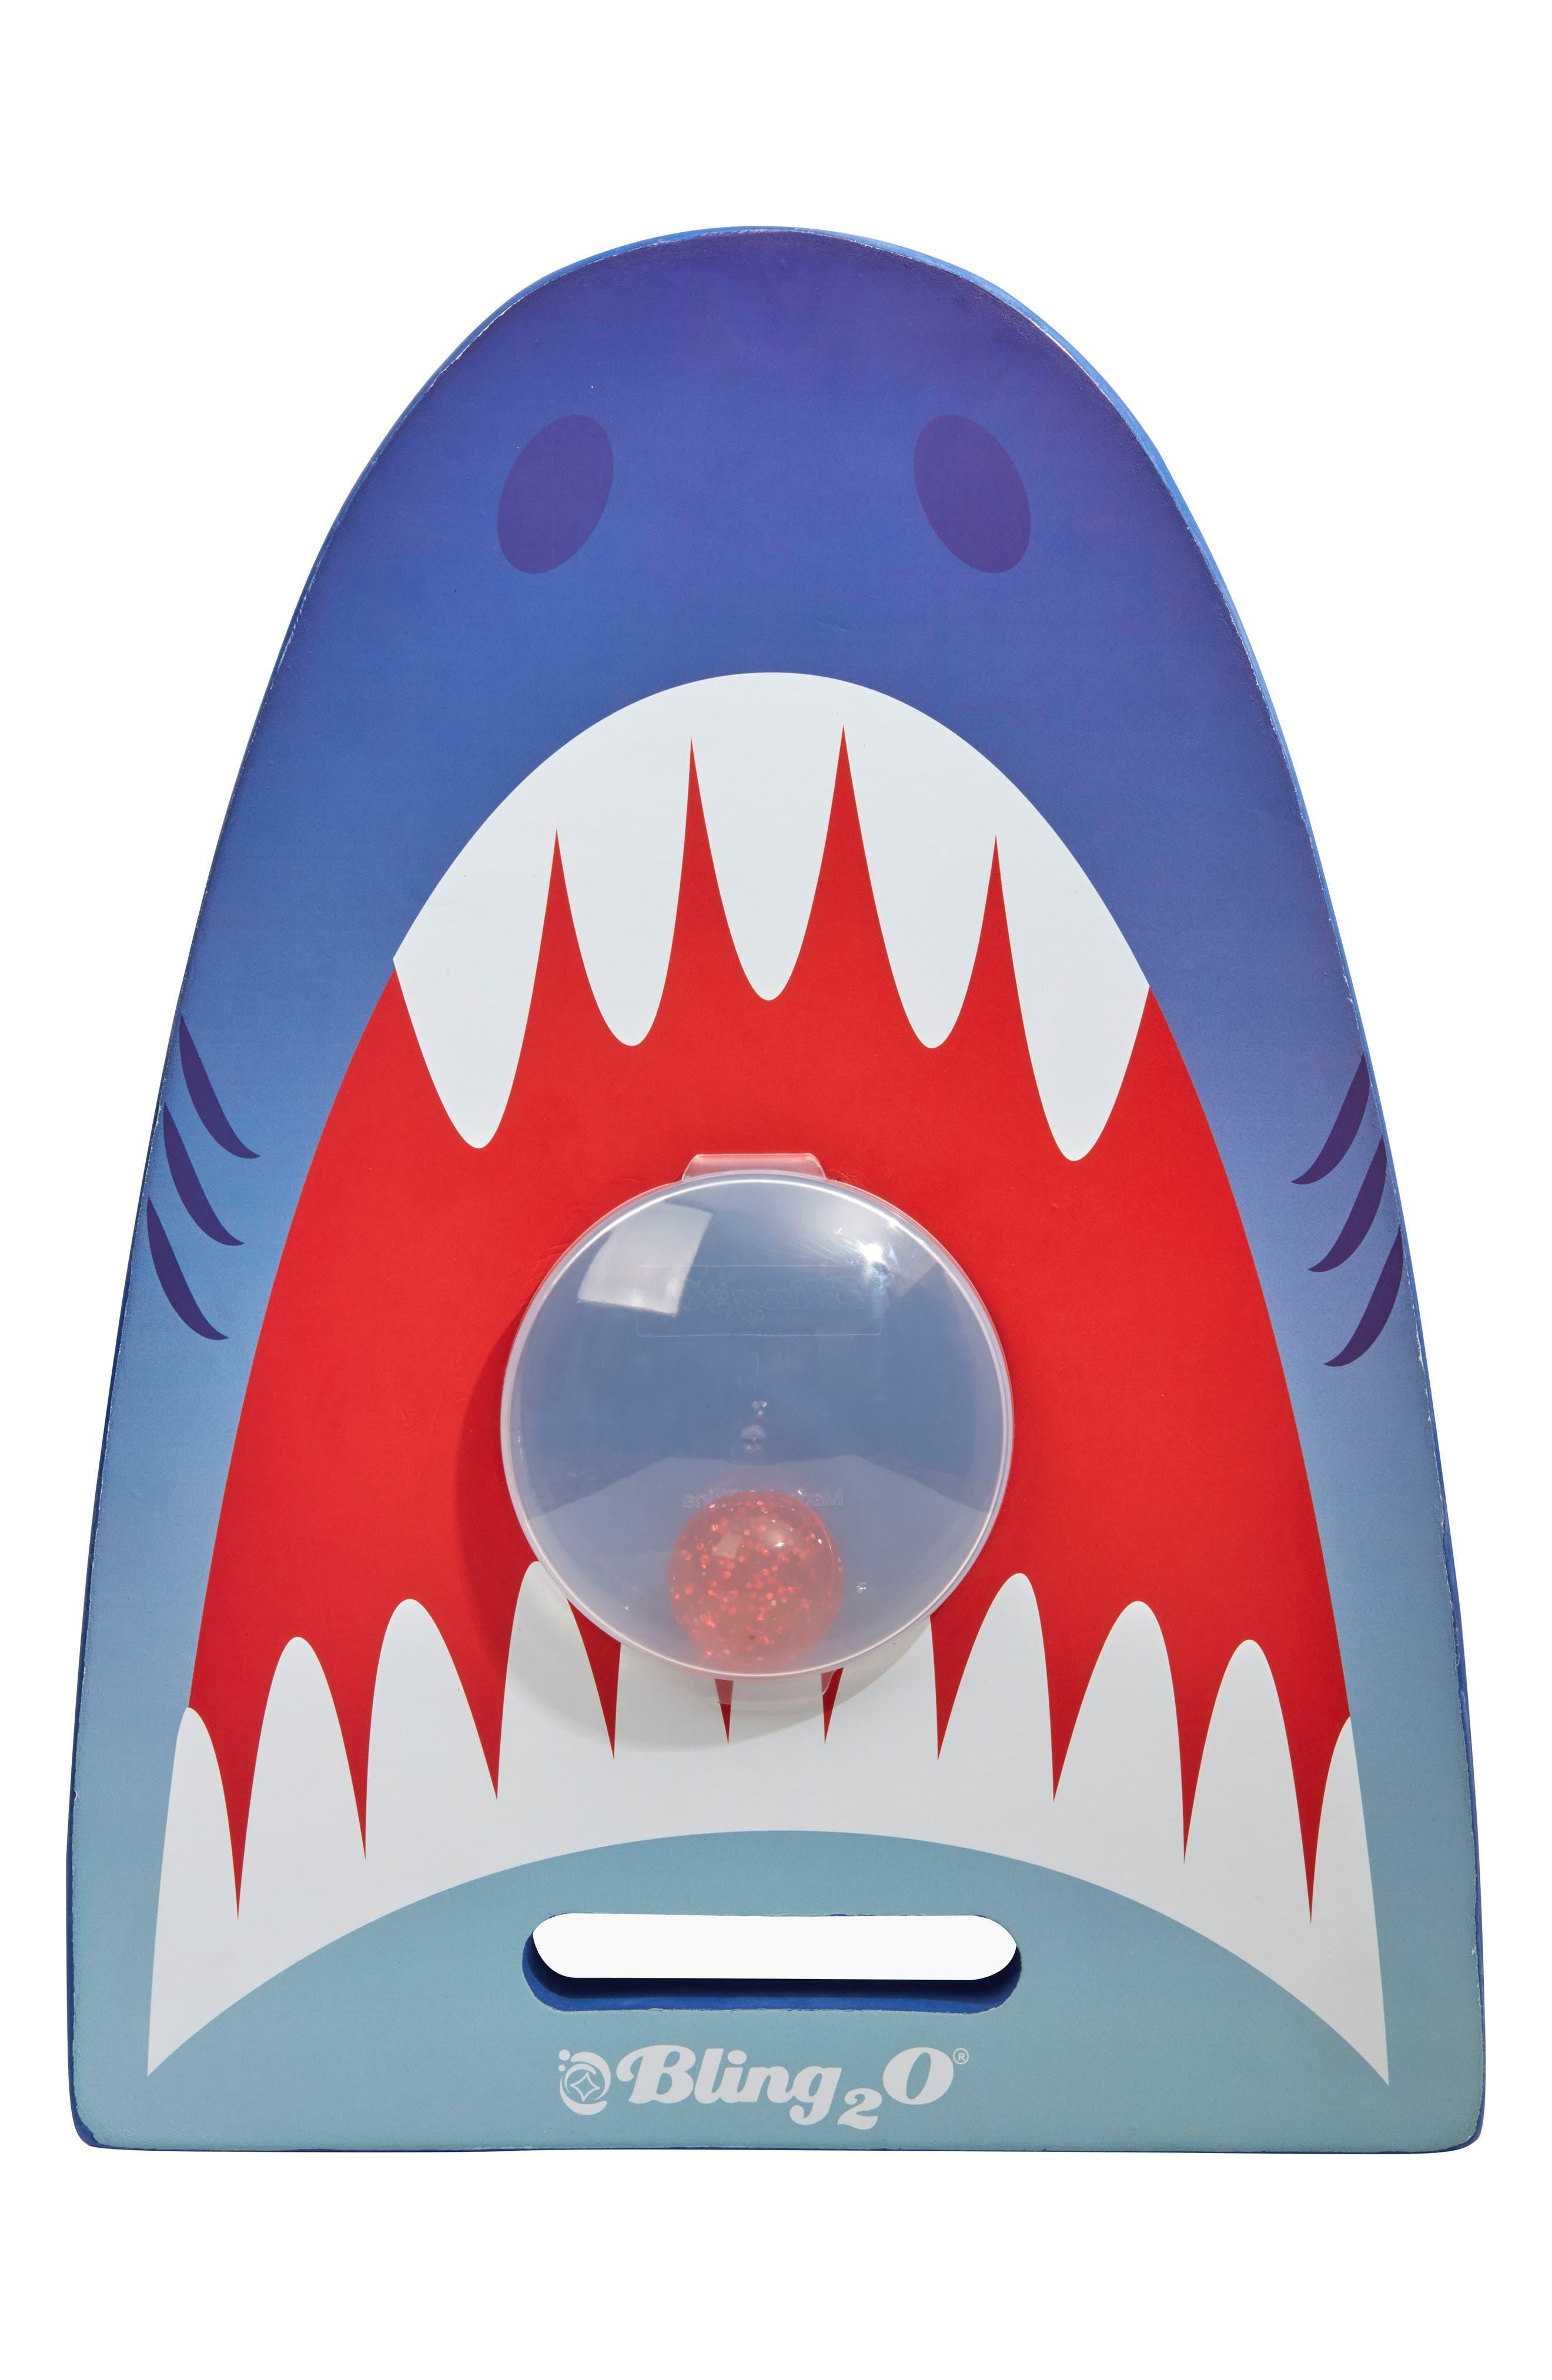 Bling2o Sam the Shark Kickboard (Kids)